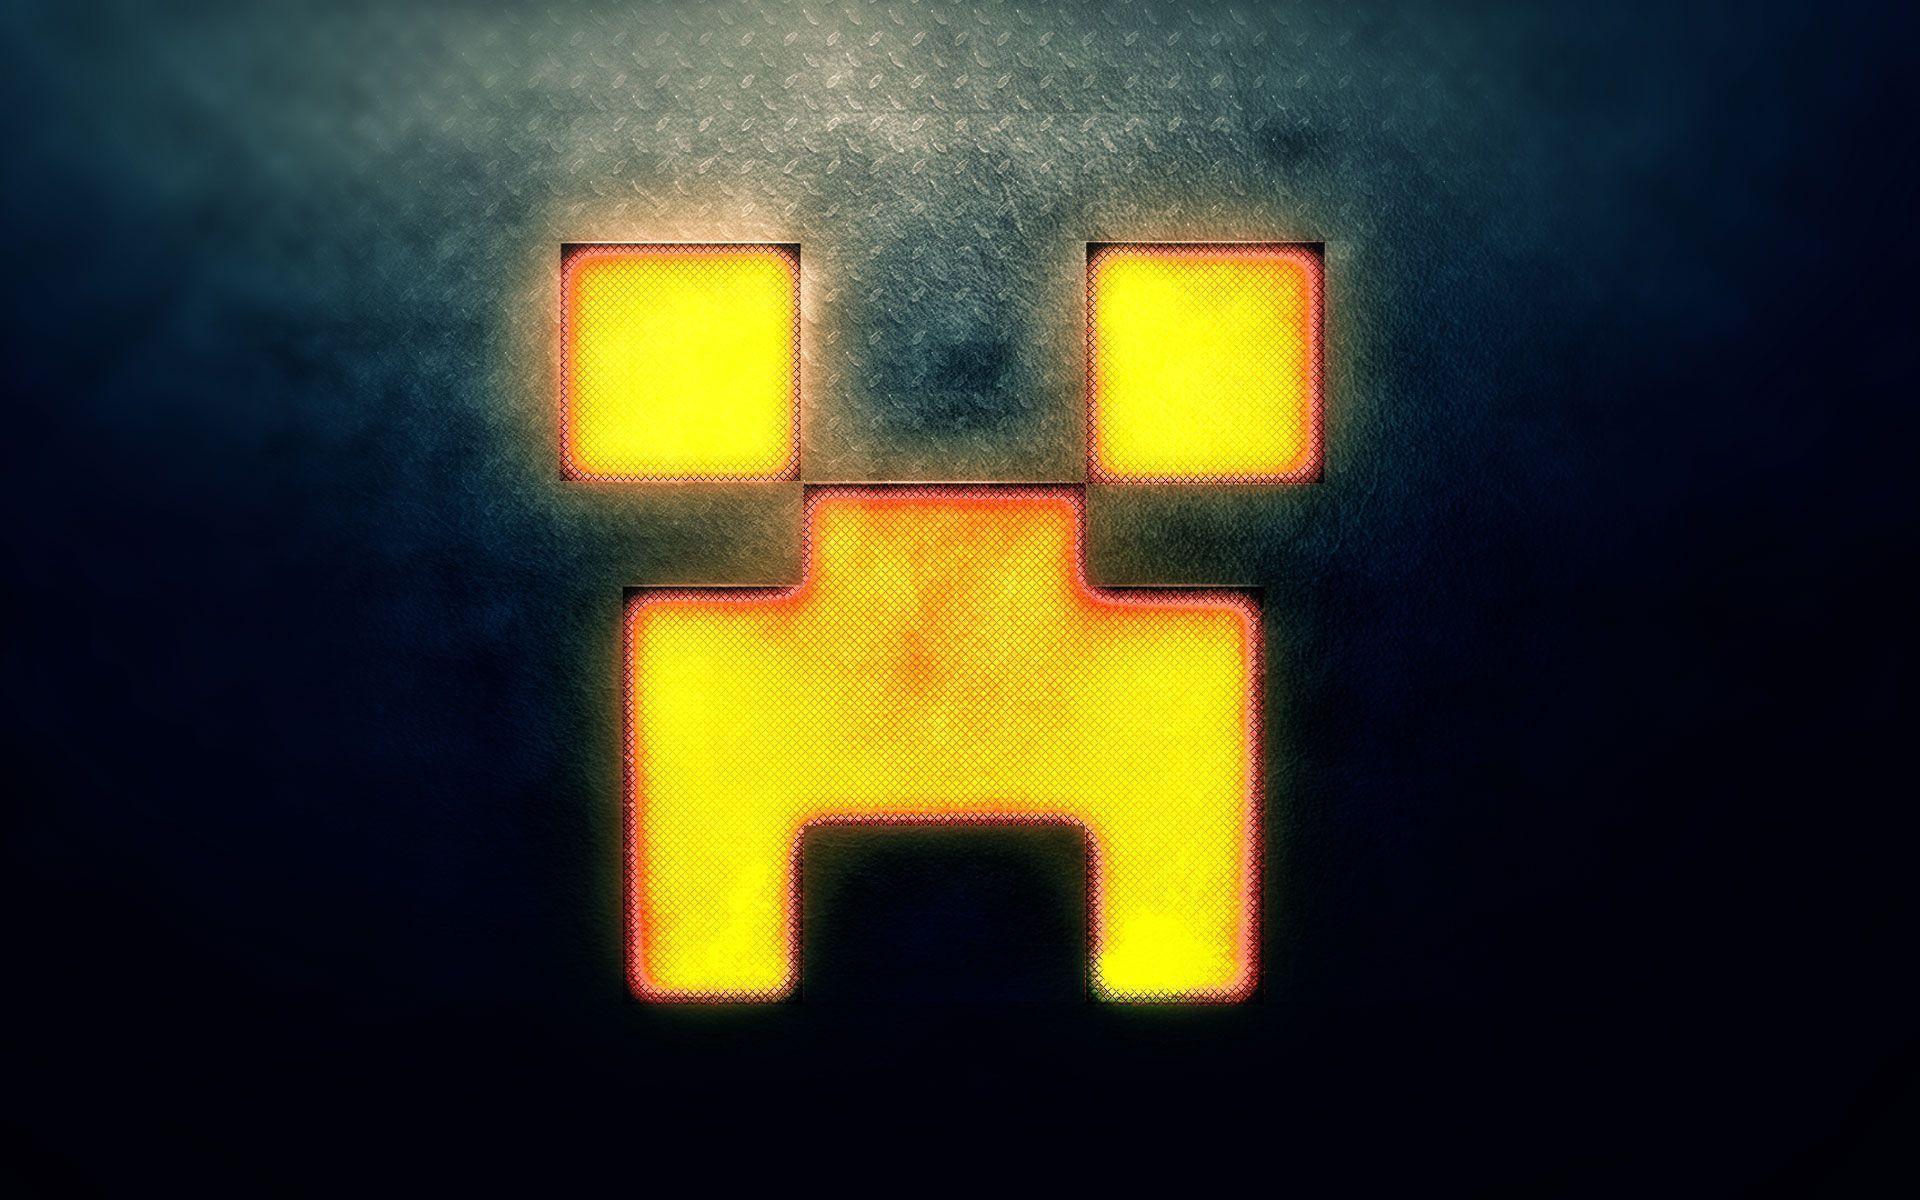 Minecraft Creeper Wallpapers Wallpaper Cave HD Wallpapers Download Free Images Wallpaper [1000image.com]